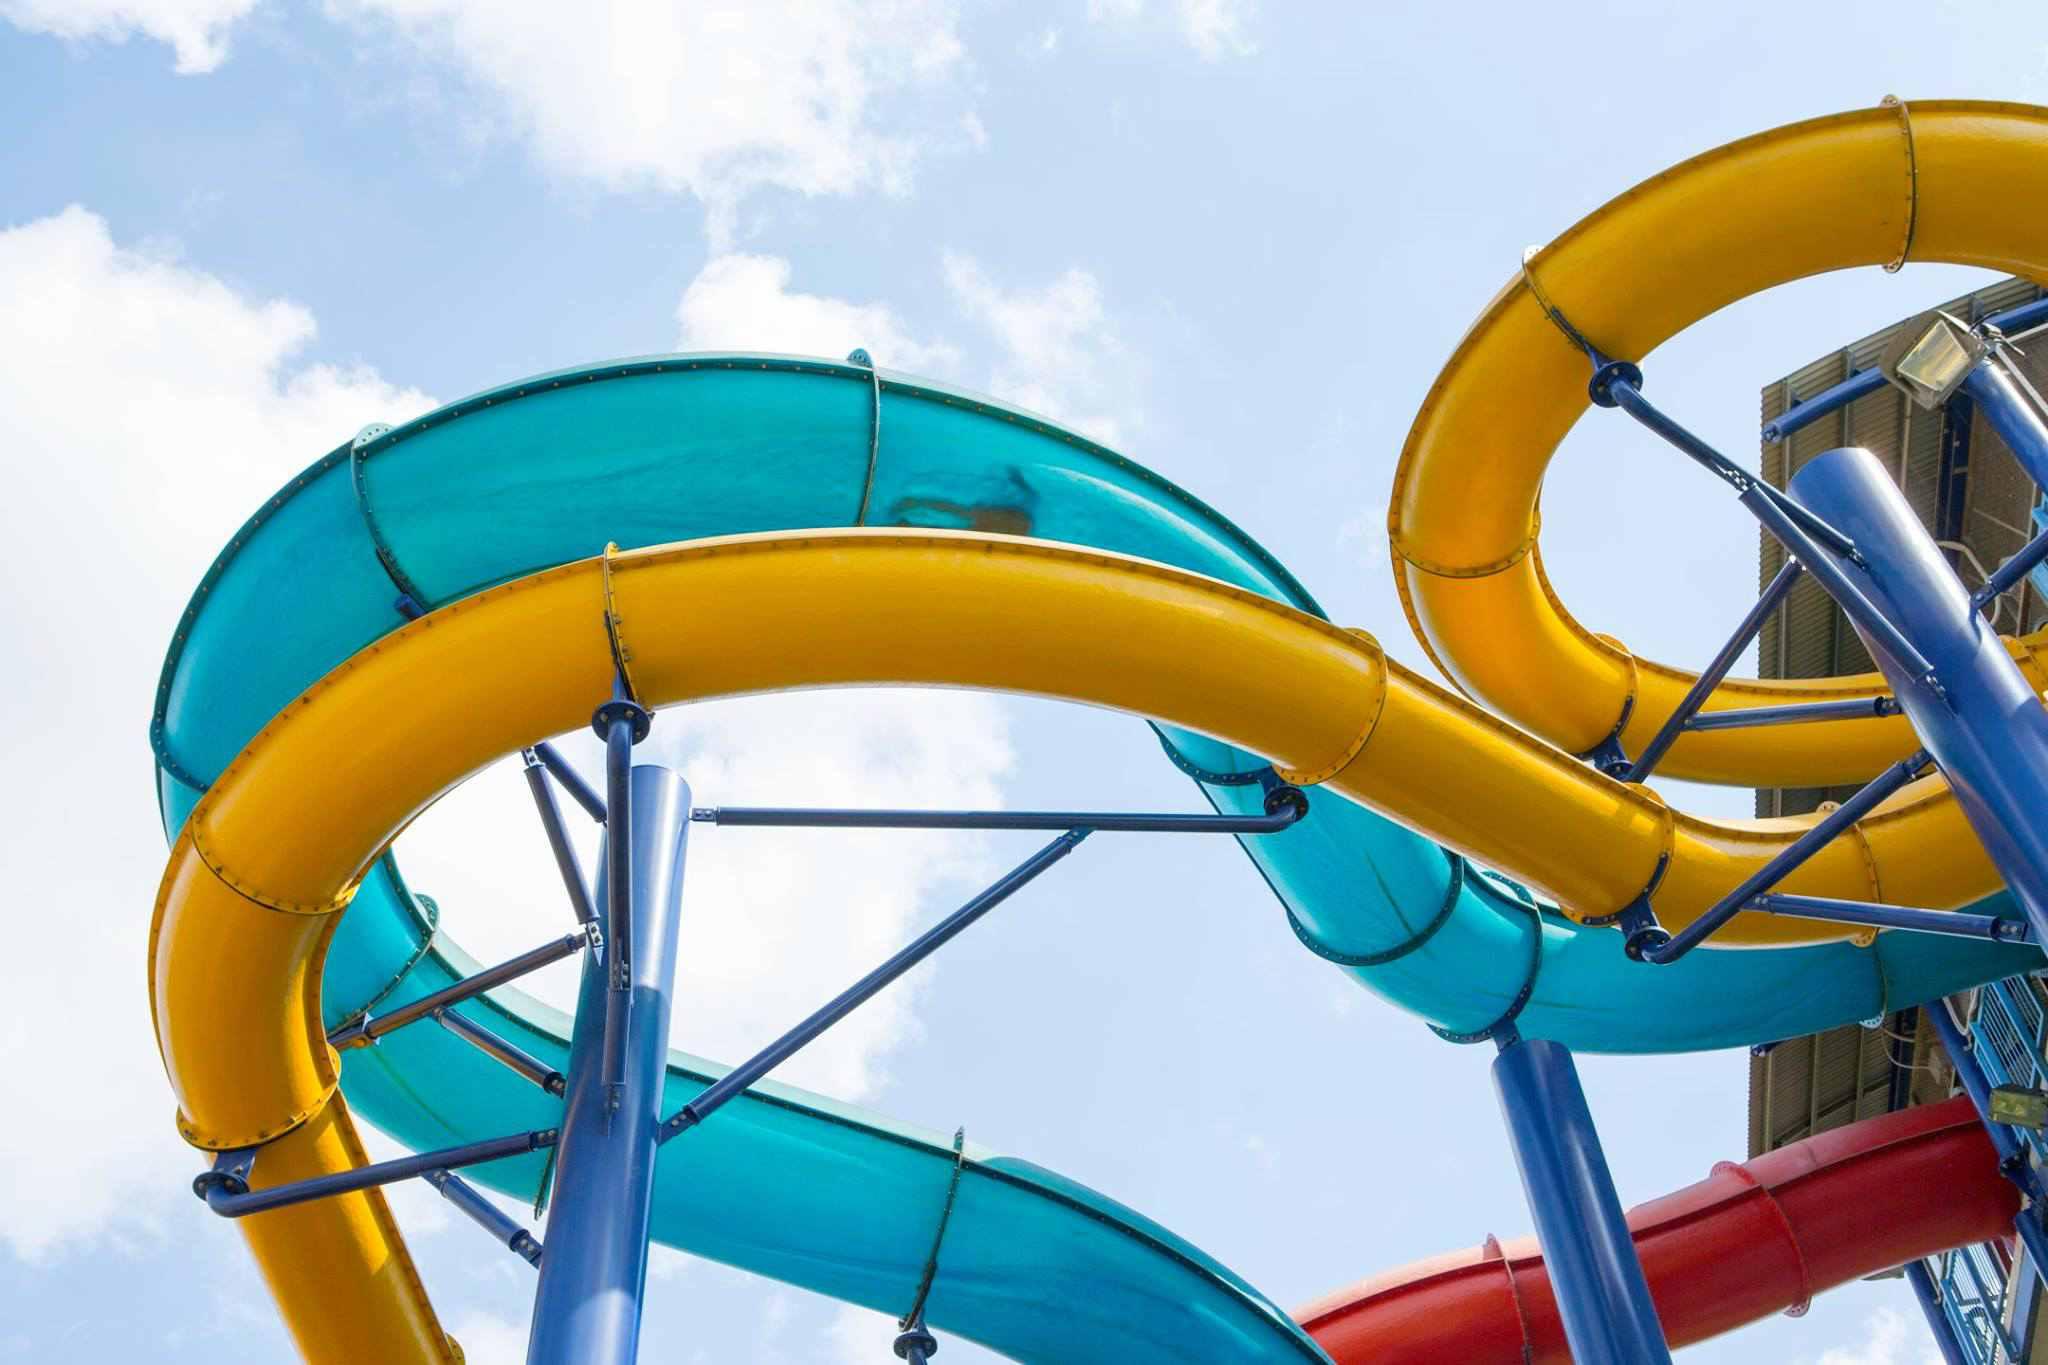 Parque recreativo Leanyer